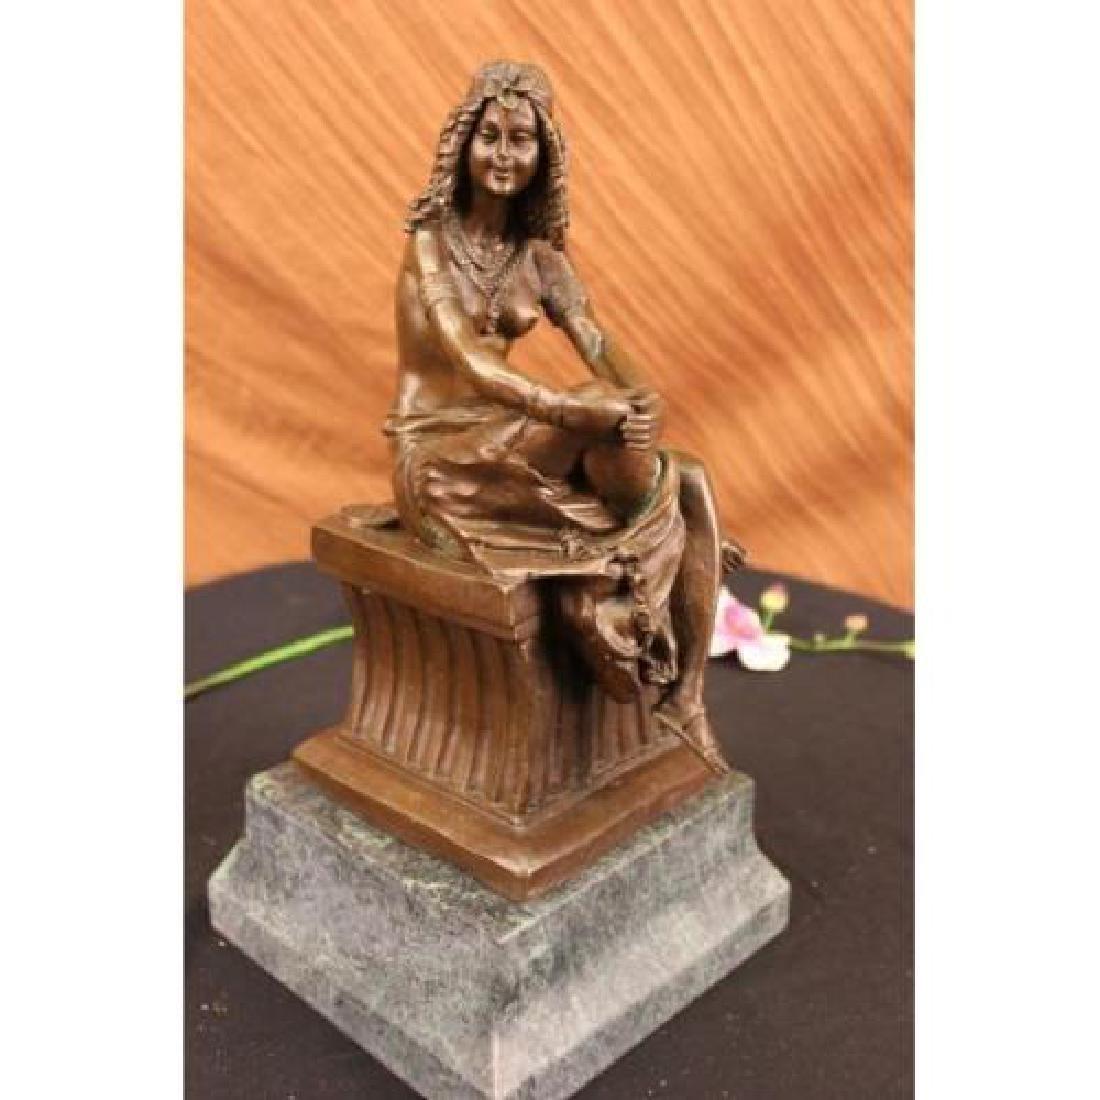 Sitting Egyptian Nude Princess Bronze Sculpture - 4